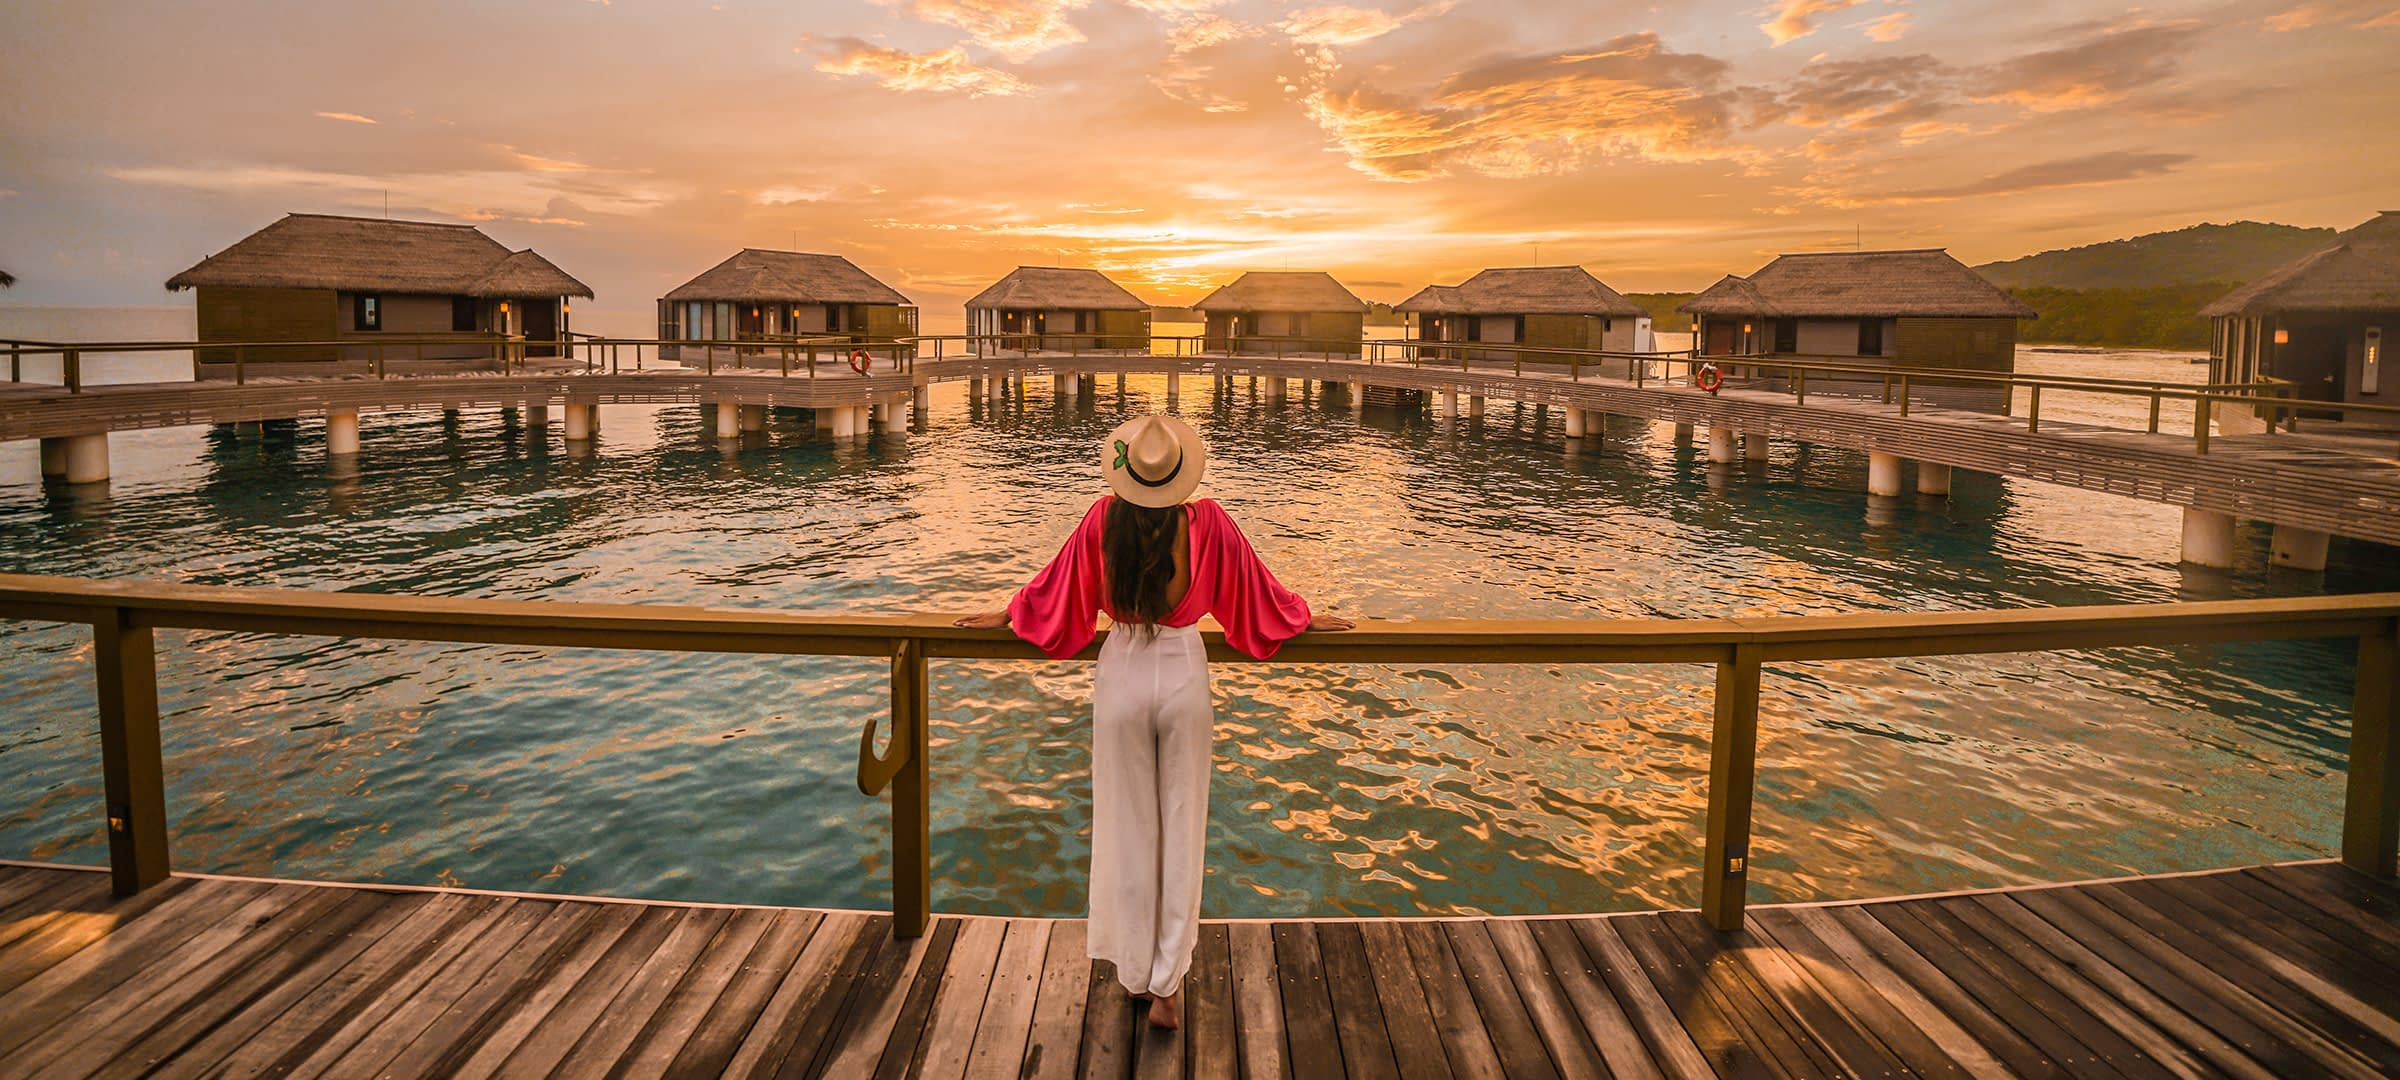 Sandals Resorts, Jamaica